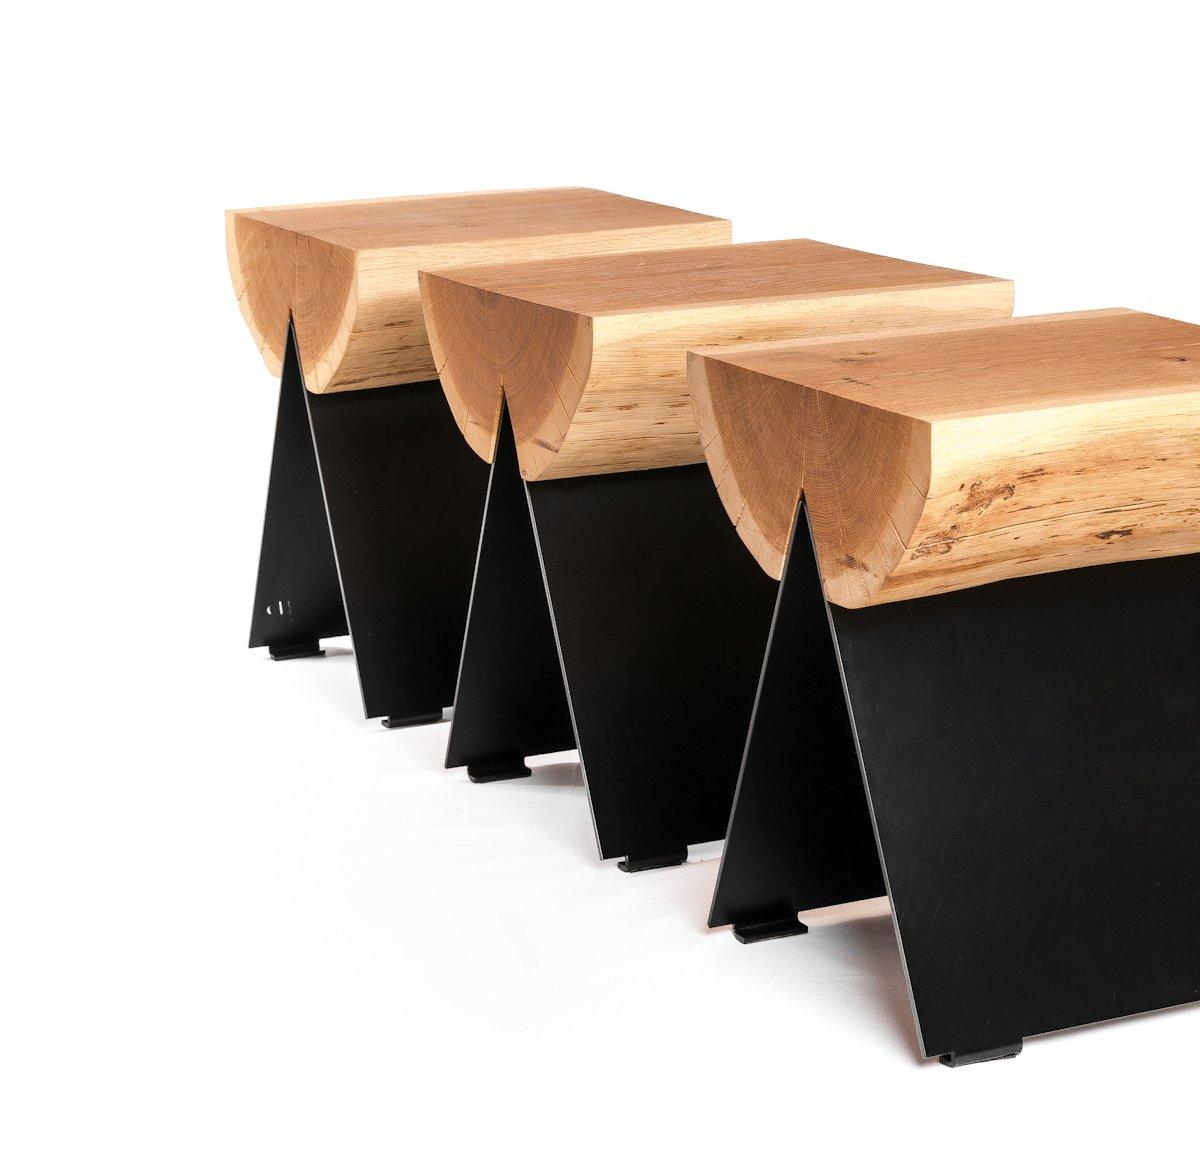 Malgorzata Knobloch, Igor Wiktorowicz, Witamina D, 1/2 Stool, дизайнерская мебель, экслюзивная мебель, универсальная мебель, садовая мебель, табурет